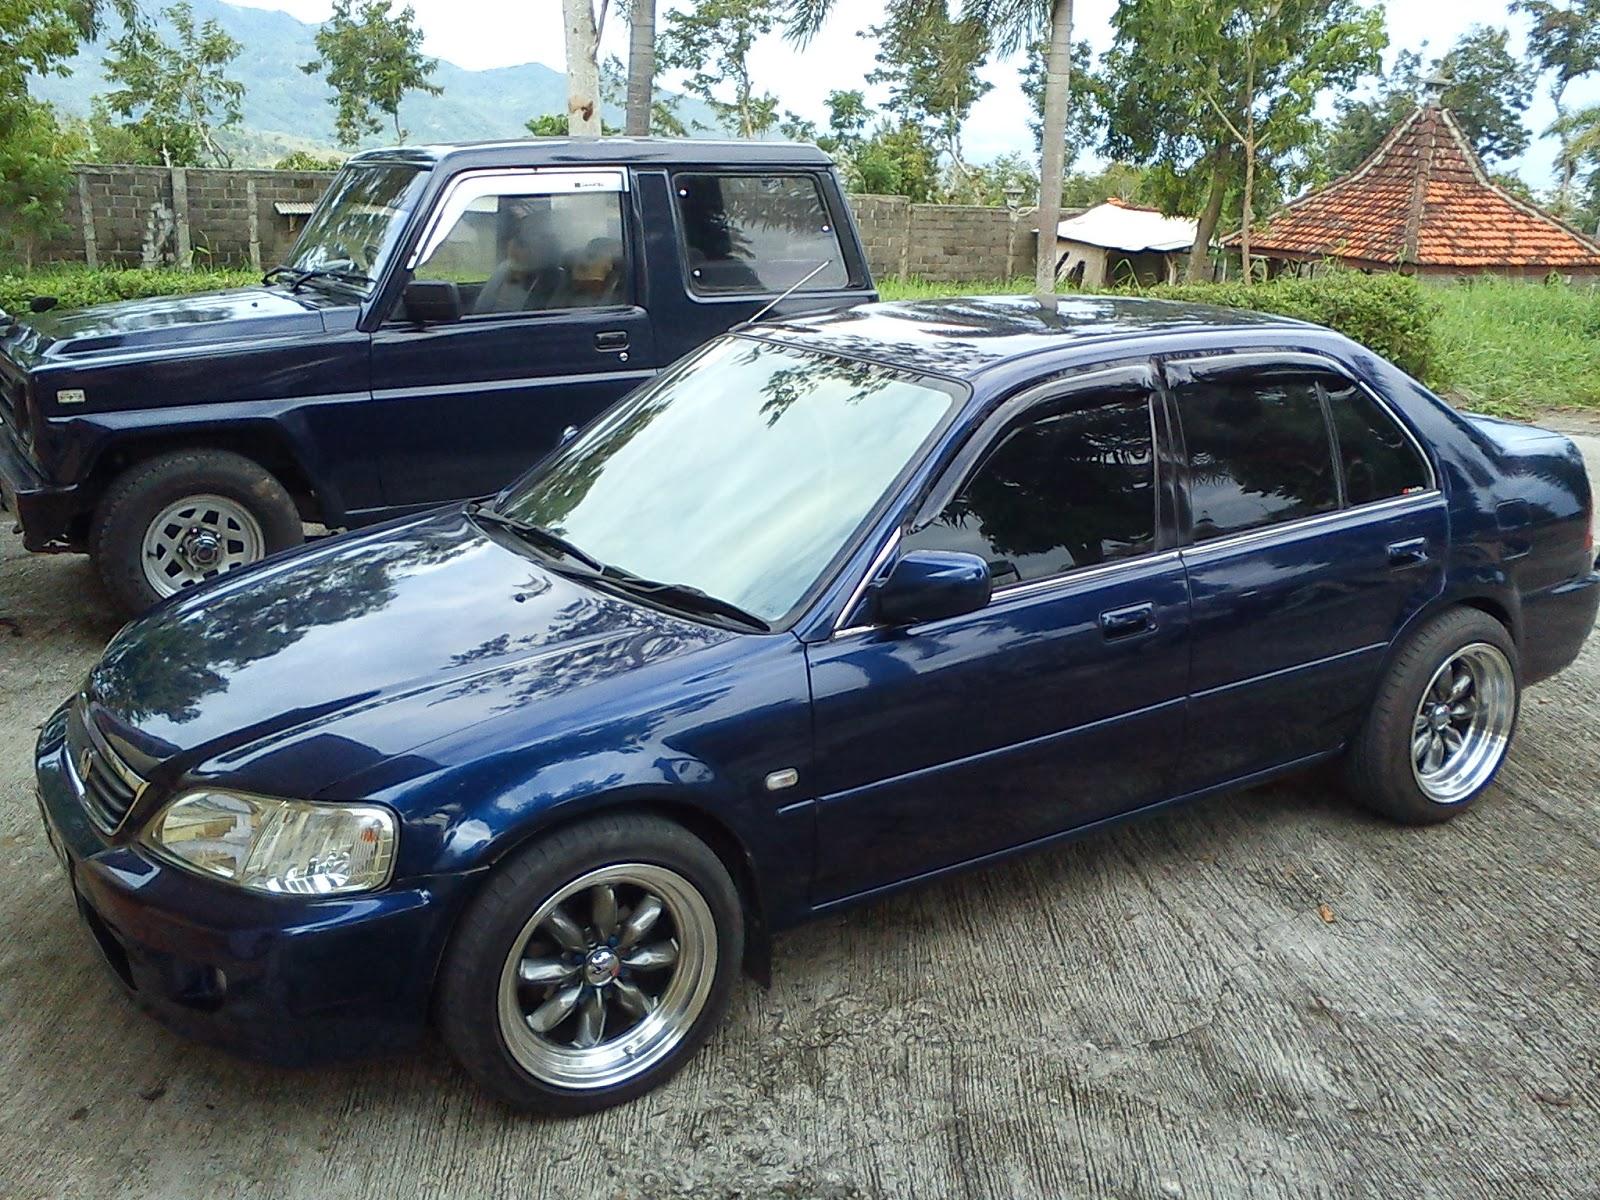 Harga Mobil Fortuner Bekas Malang – MobilSecond.Info